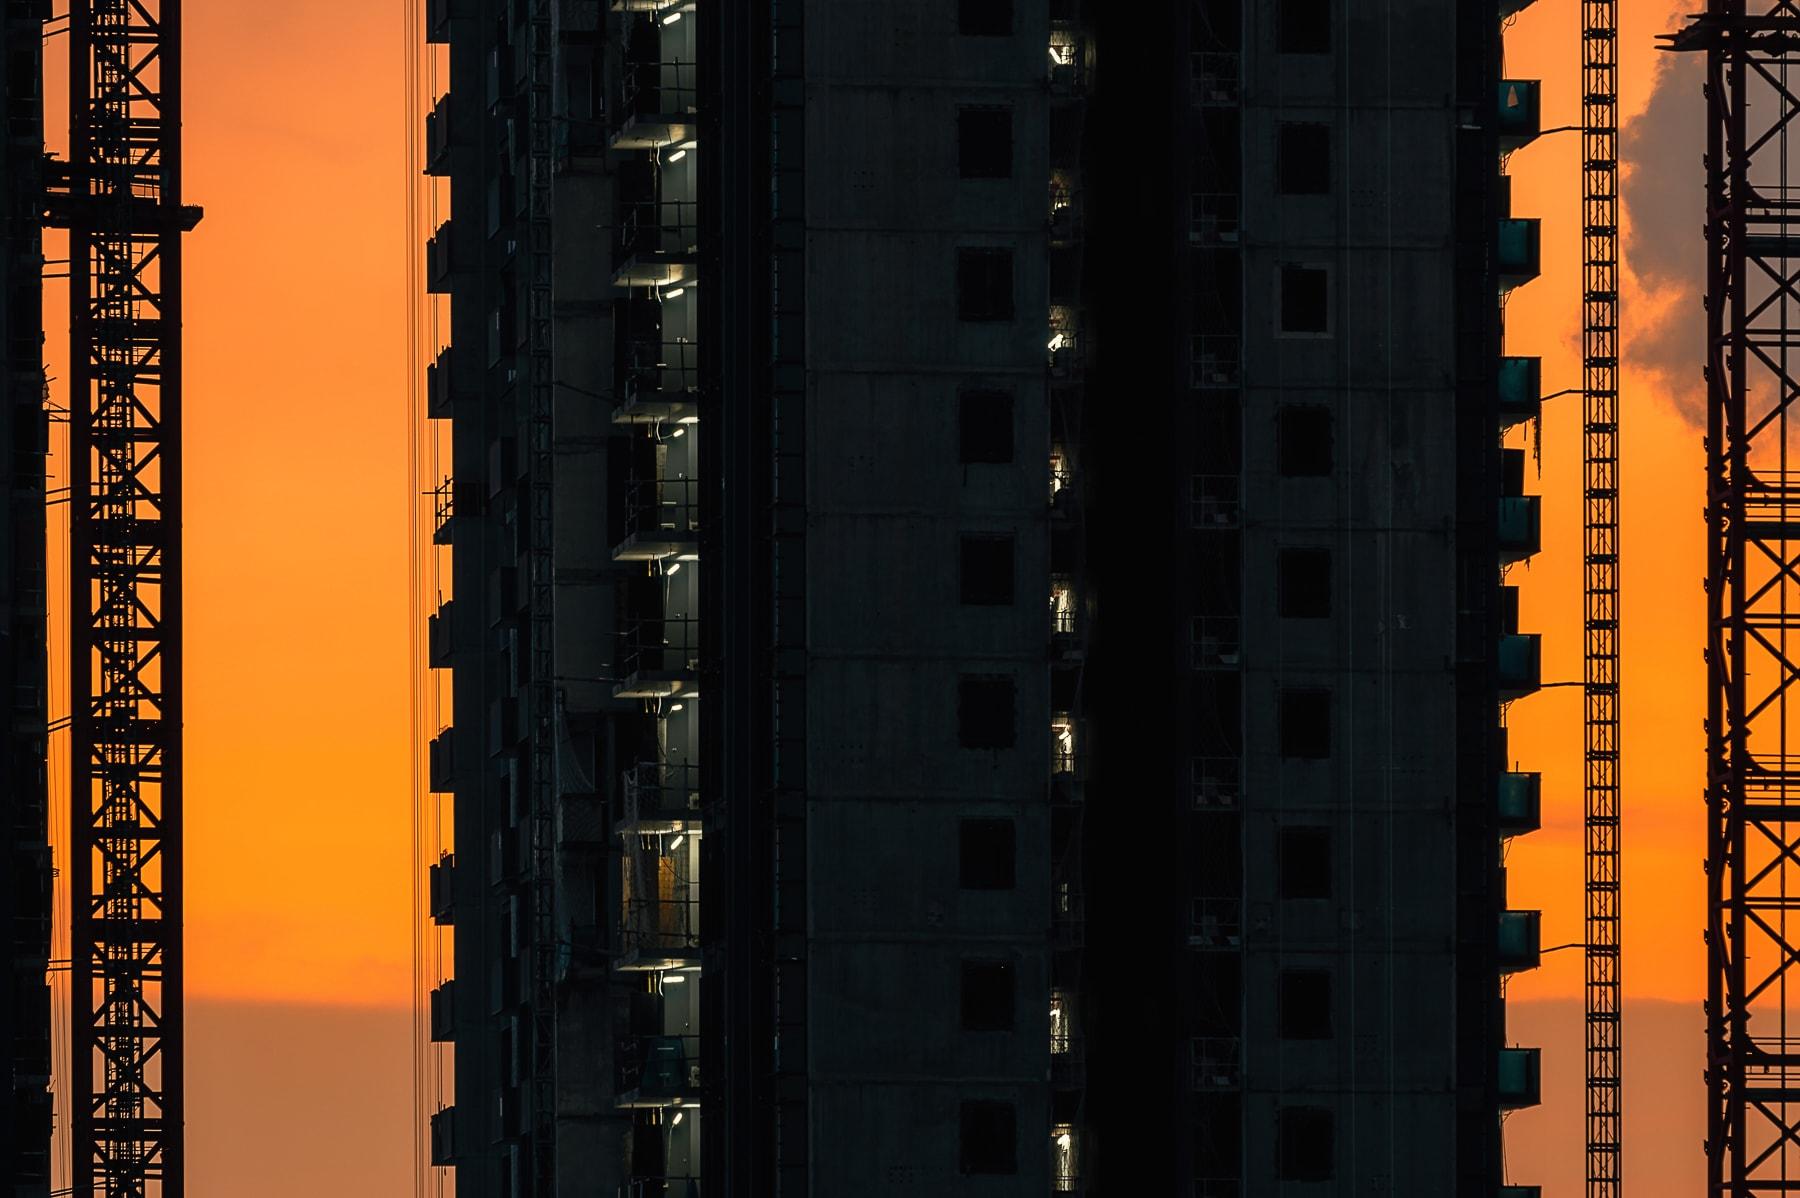 Singapore cityscape sunset